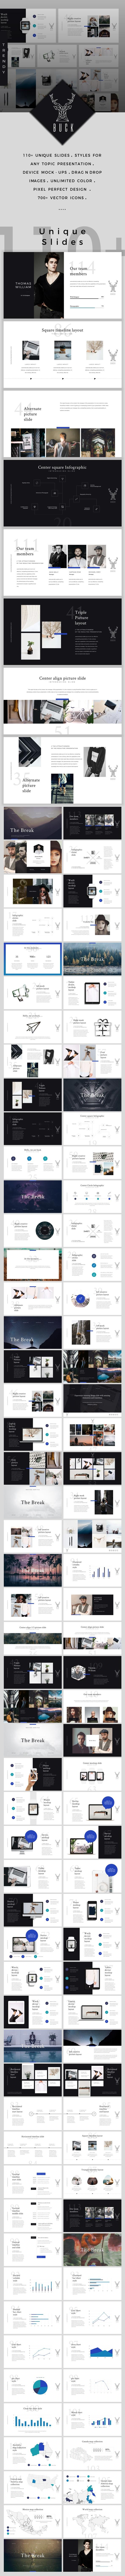 Buck Multipurpose Theme - Business PowerPoint Templates